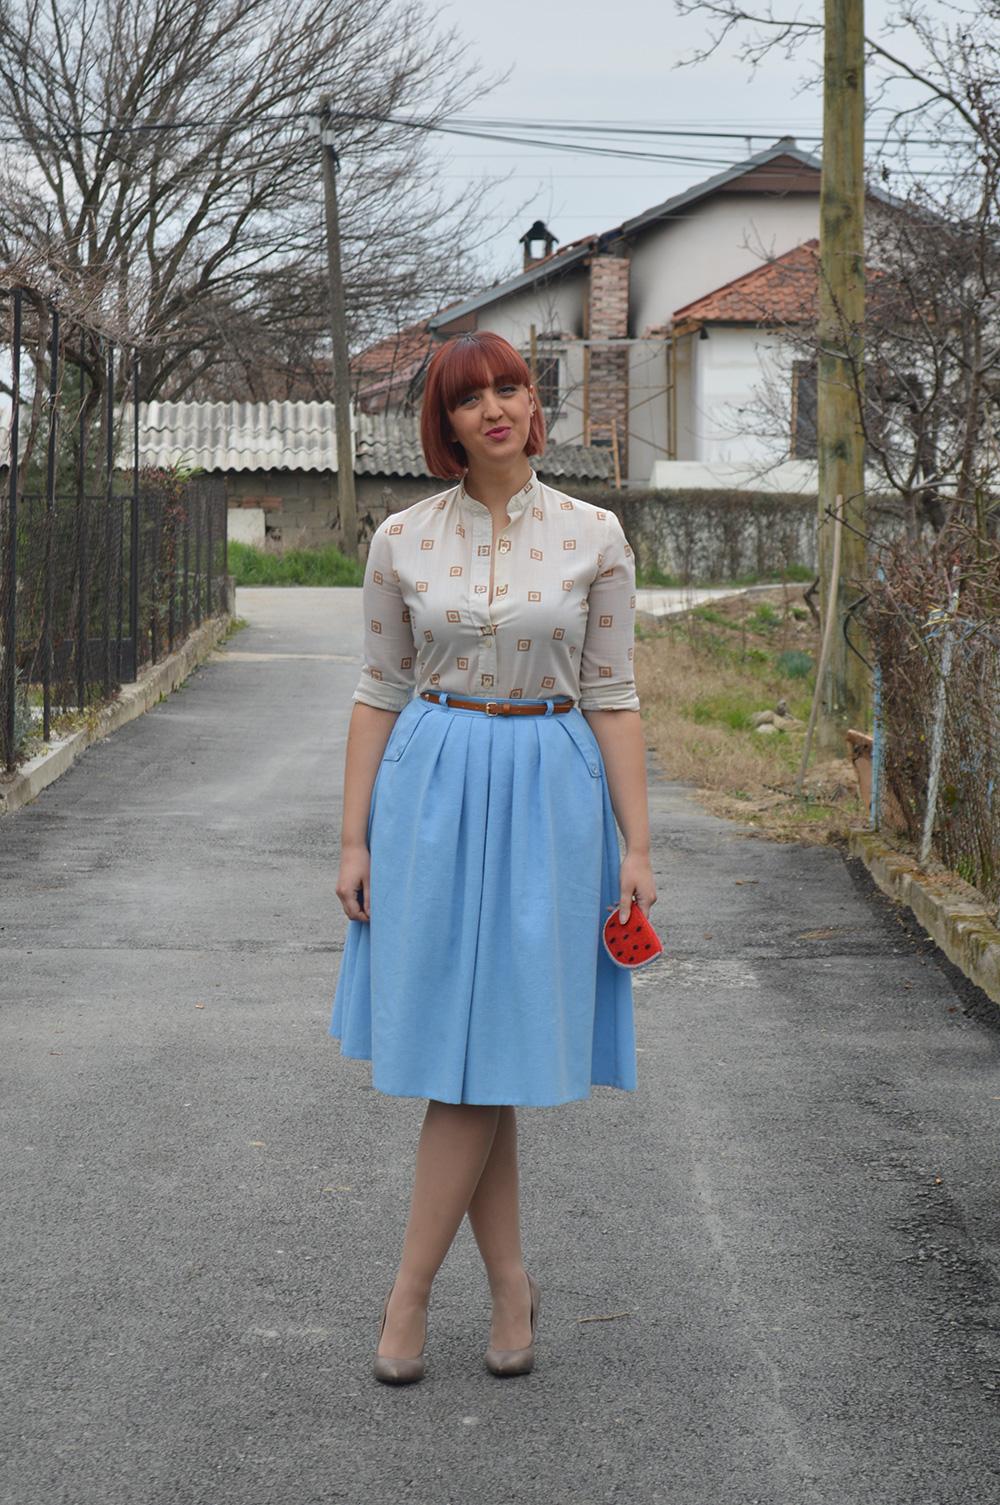 baby blue vintage skirt vintage blouse half pointed stilletos Bershka belt watermelon purse